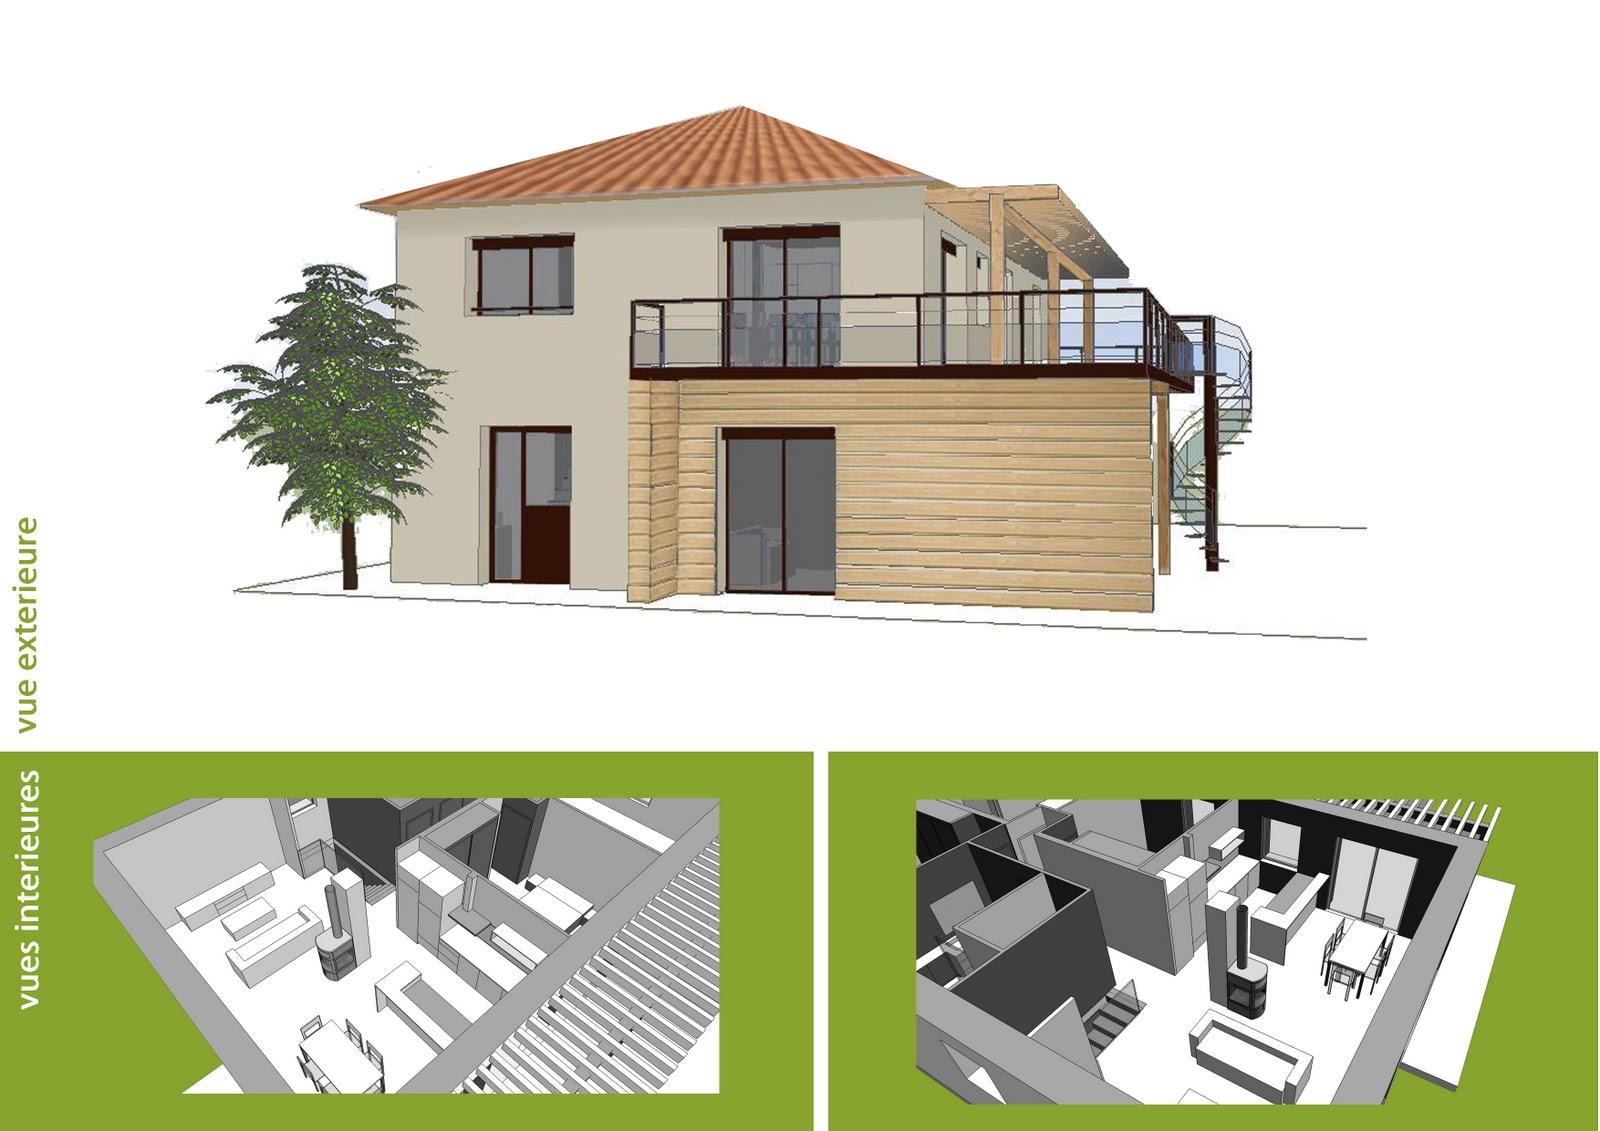 sonnerat architecture r novation. Black Bedroom Furniture Sets. Home Design Ideas